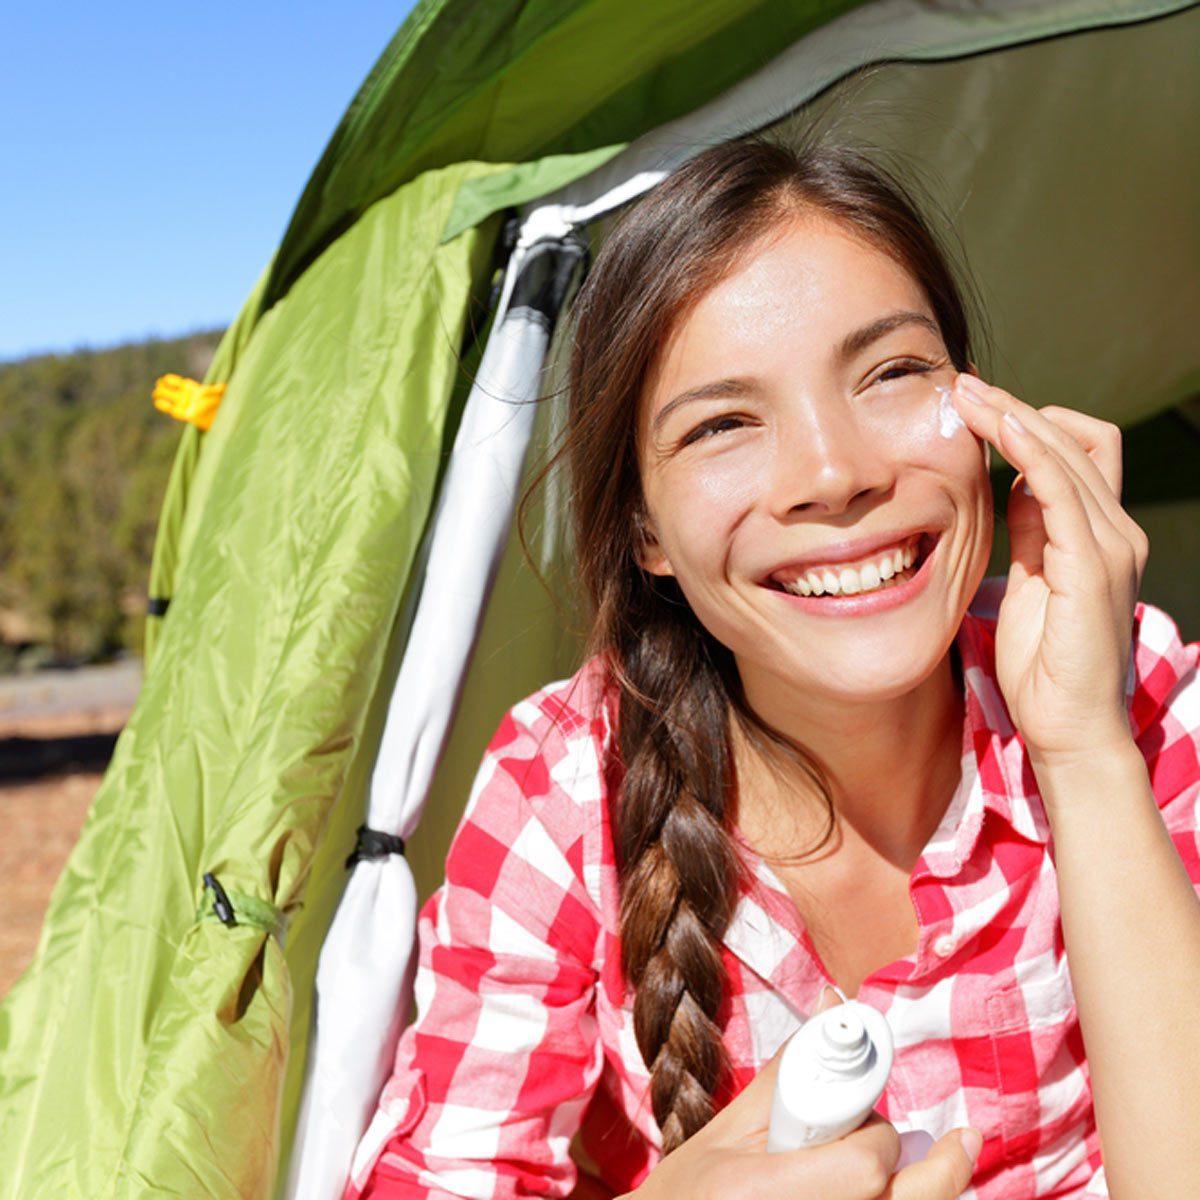 camping tent sunscreen